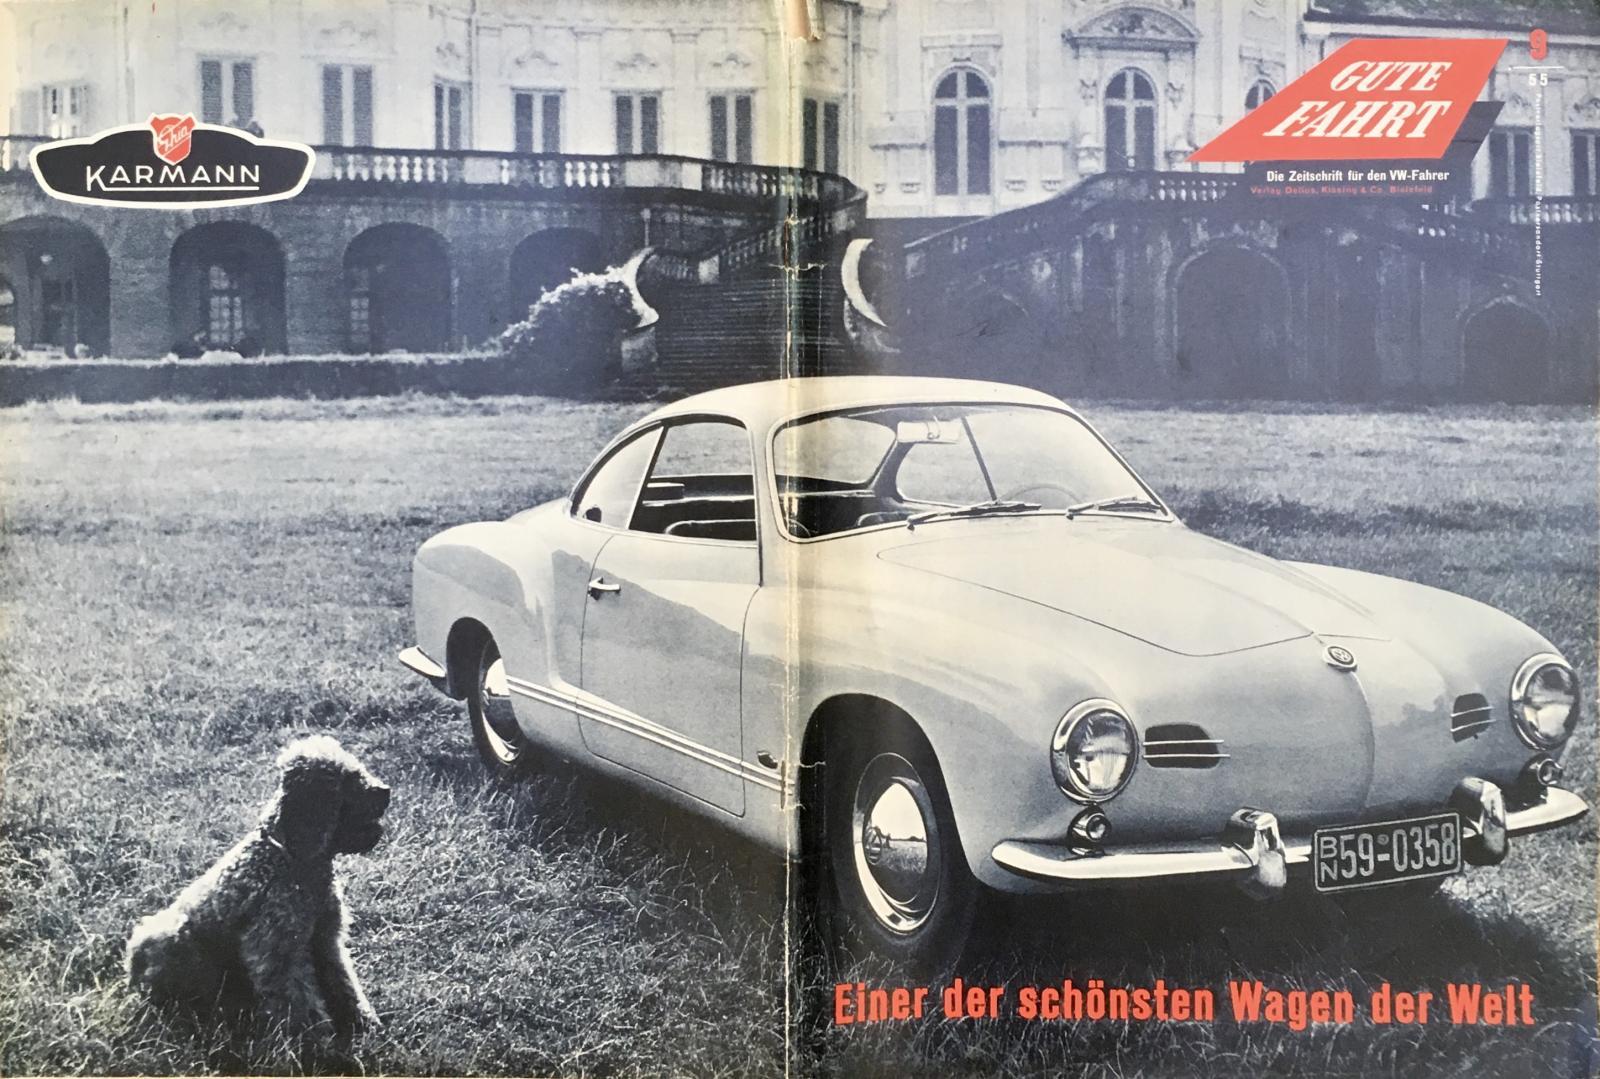 1955 Gazelle beige lowlight Karmann Ghia coupe